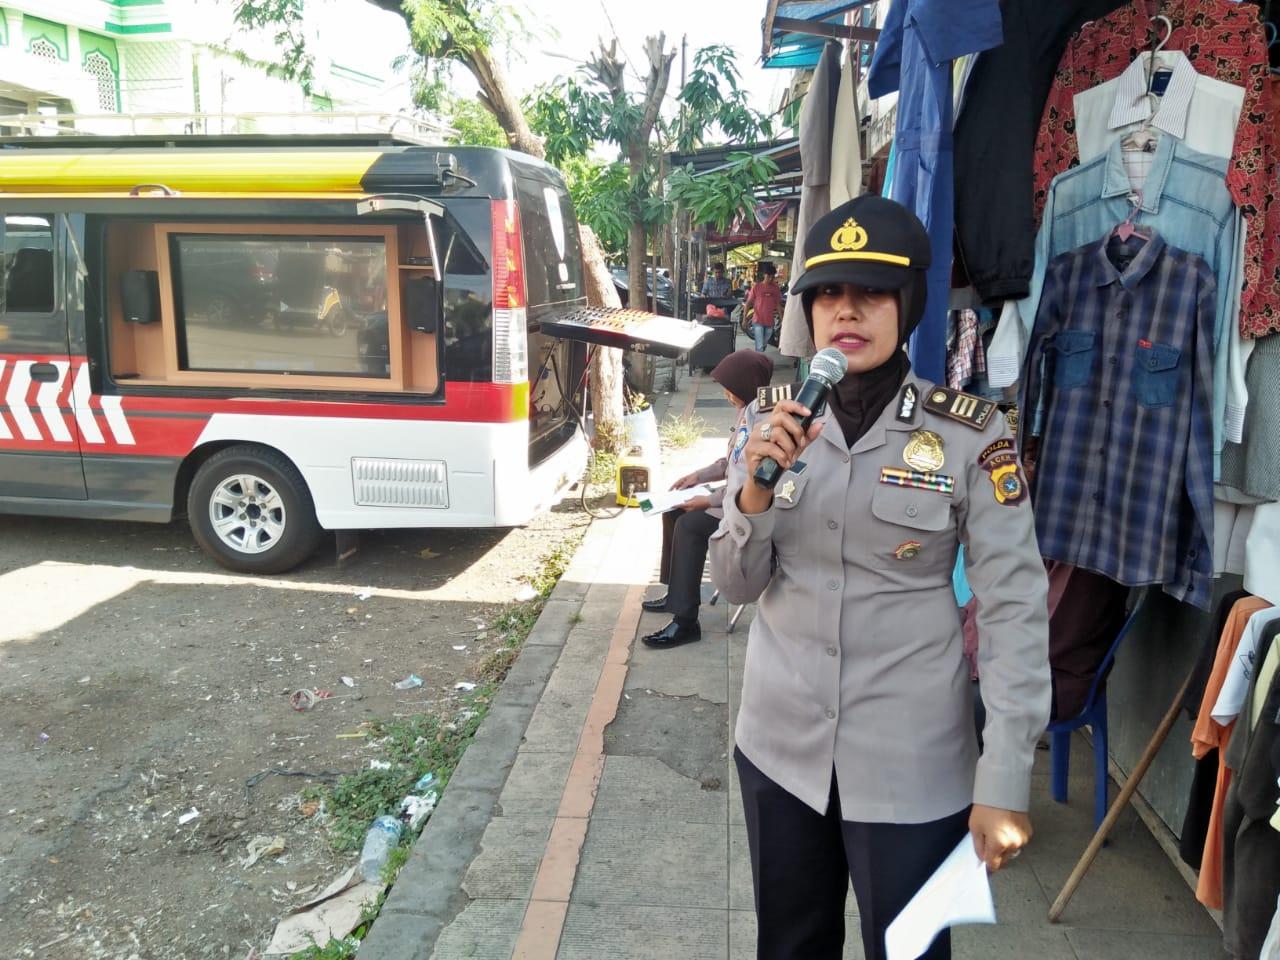 Dirbinmas Polda Aceh Himbau Masyarakat Ikut Partisipasi Cegah Corona